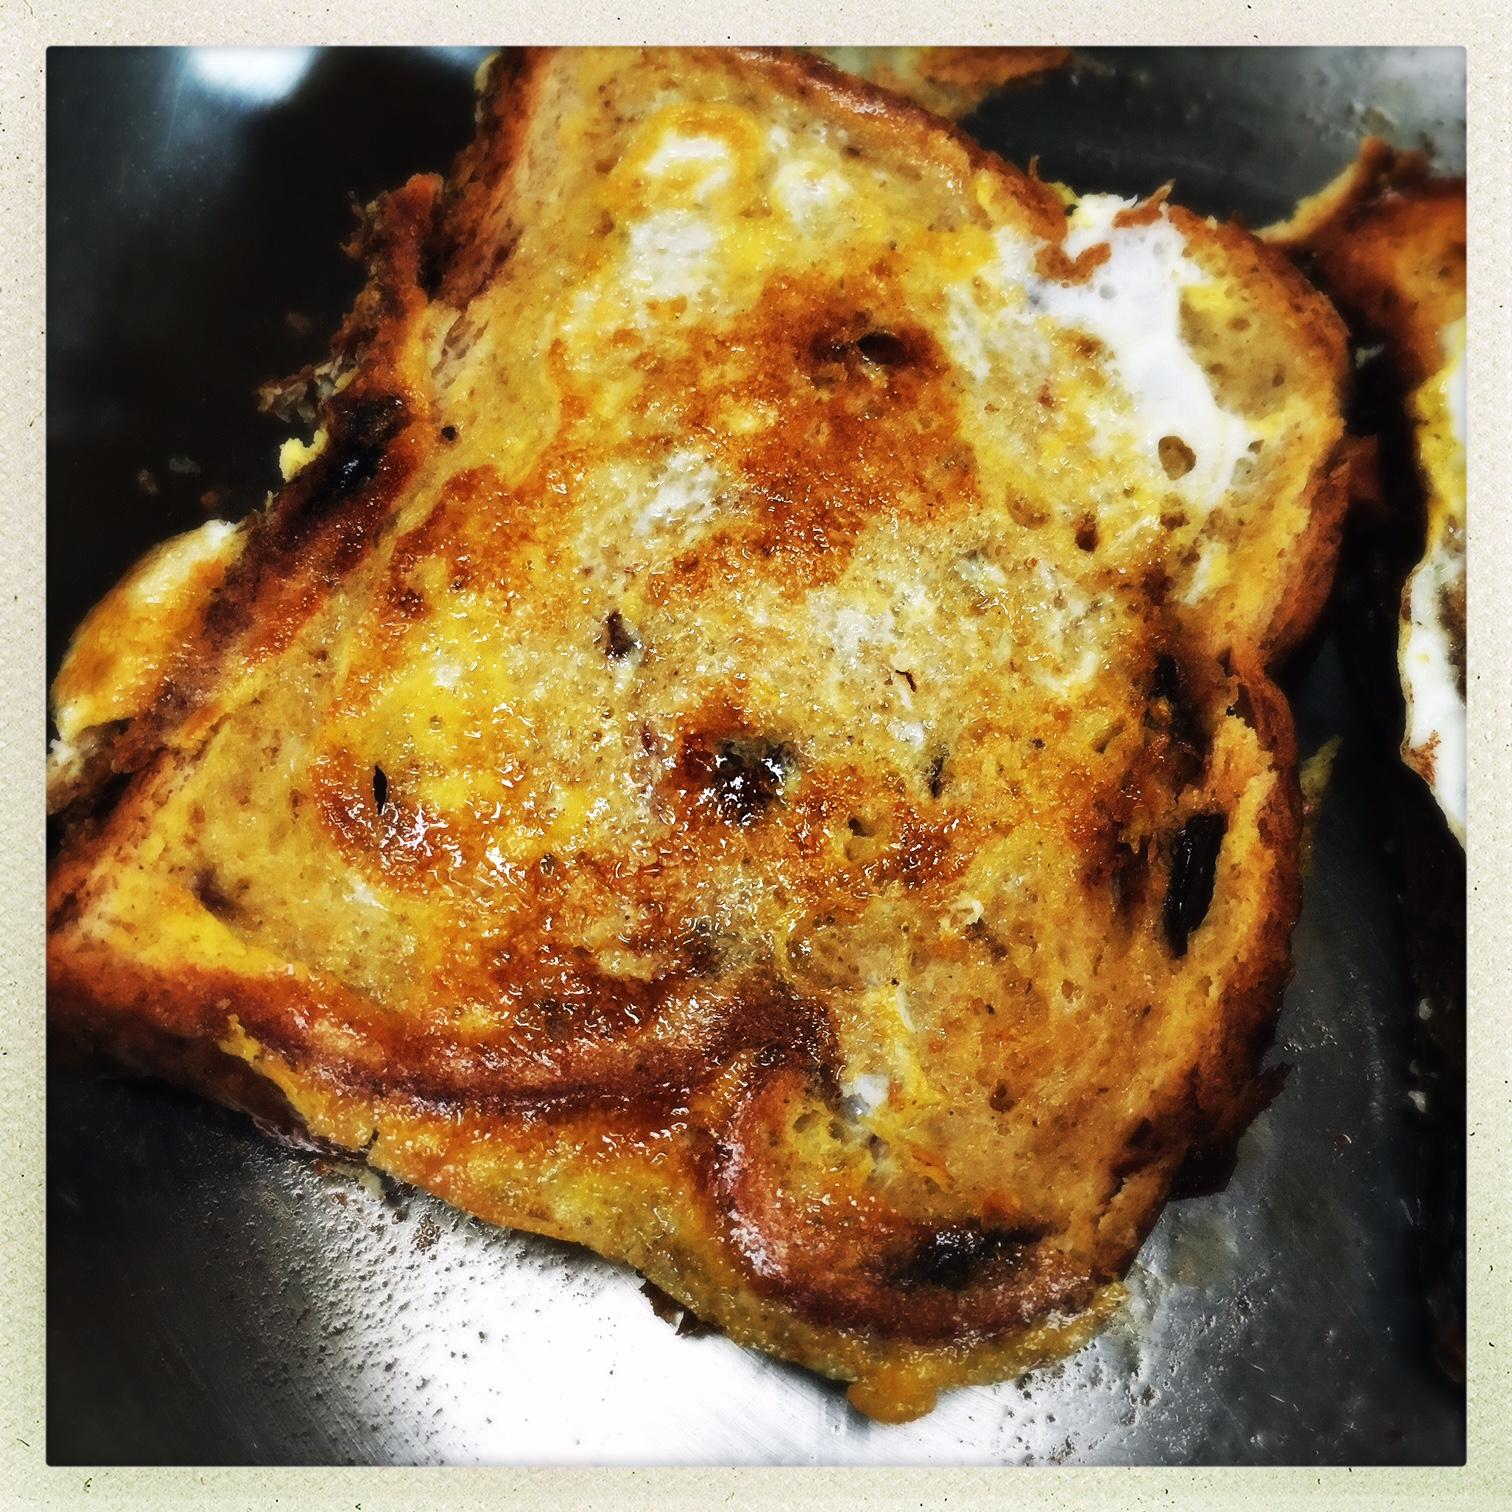 finished fried french toast.jpg